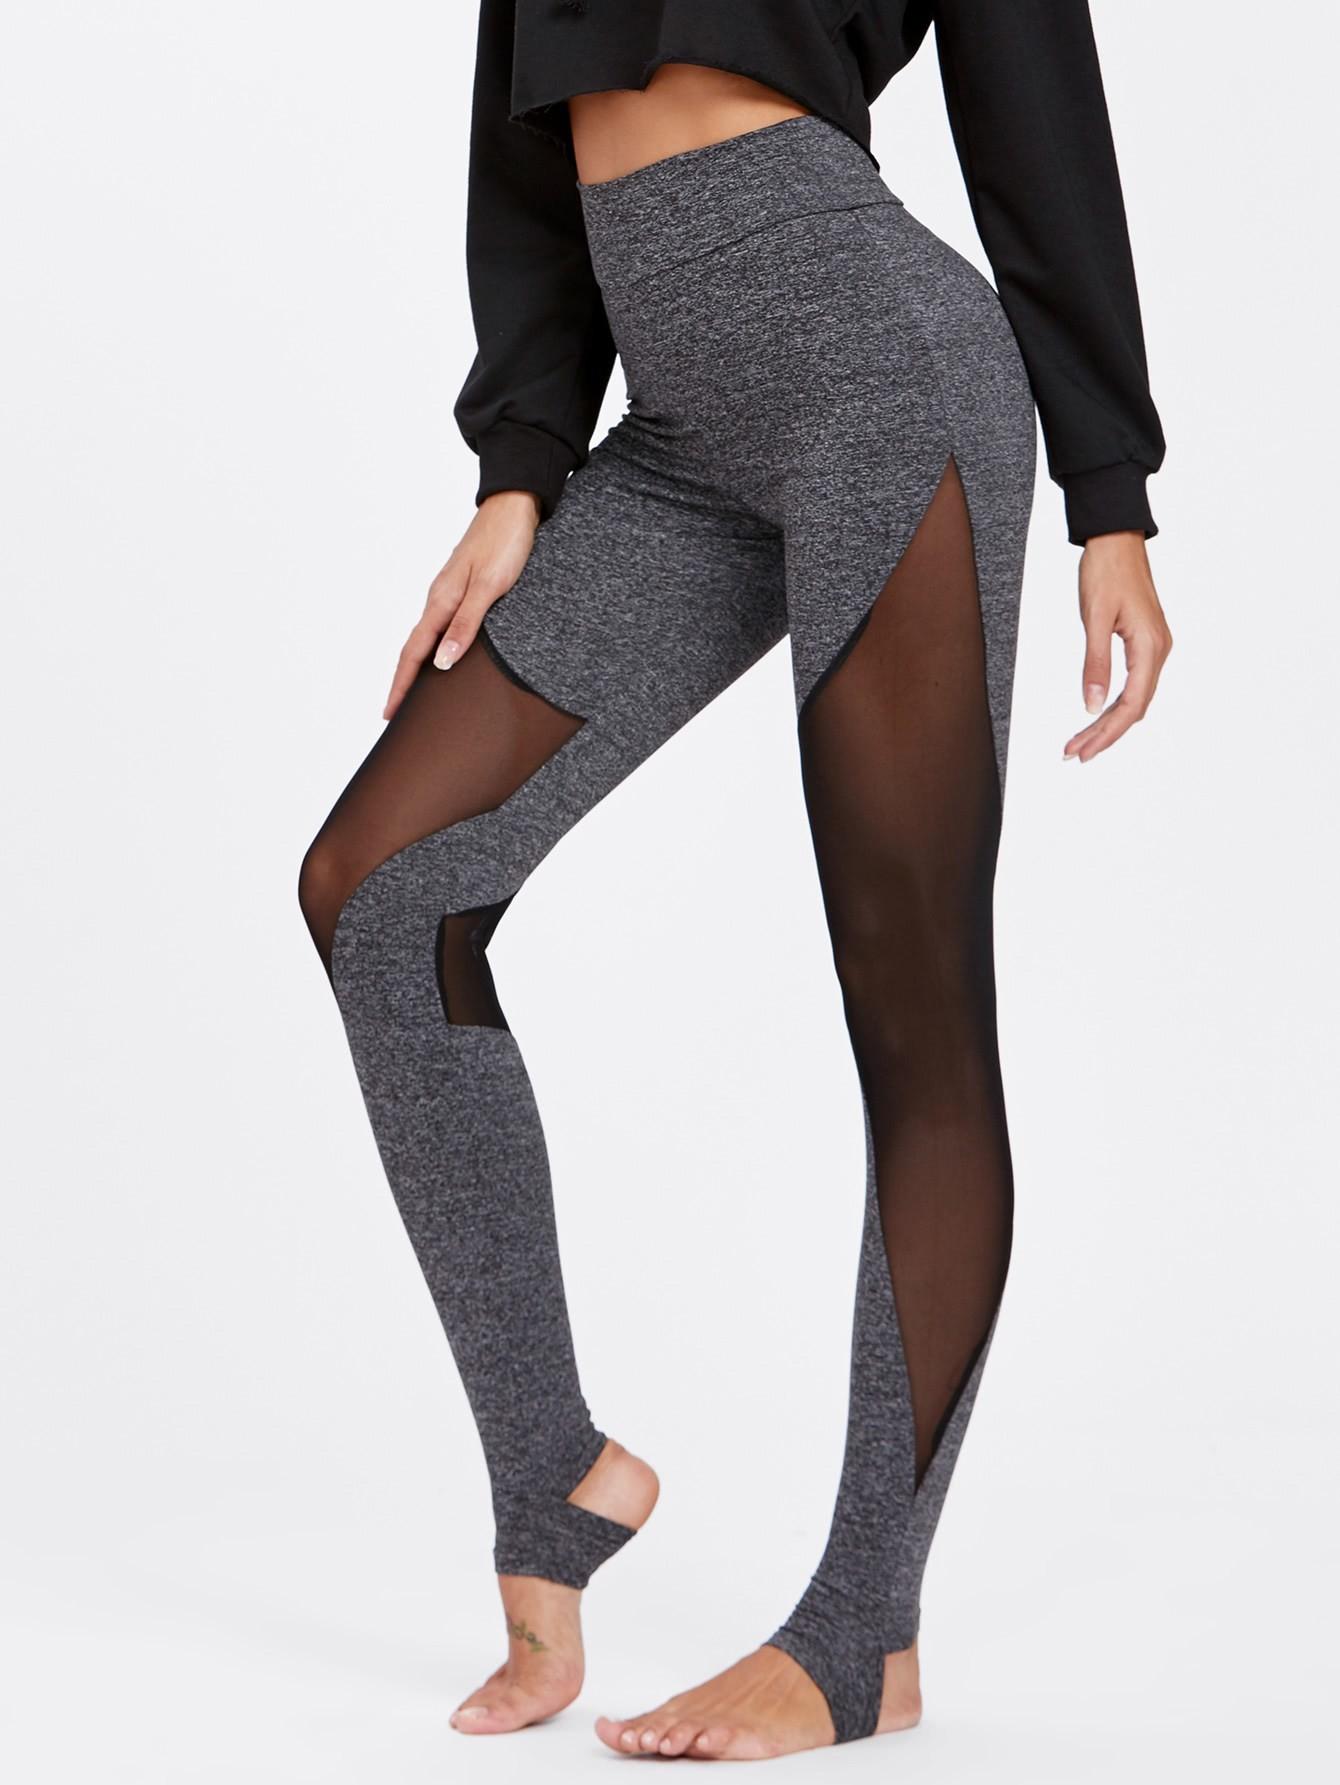 Mesh Insert Heathered Knit Stirrup Leggings marled knit topstitch stirrup leggings